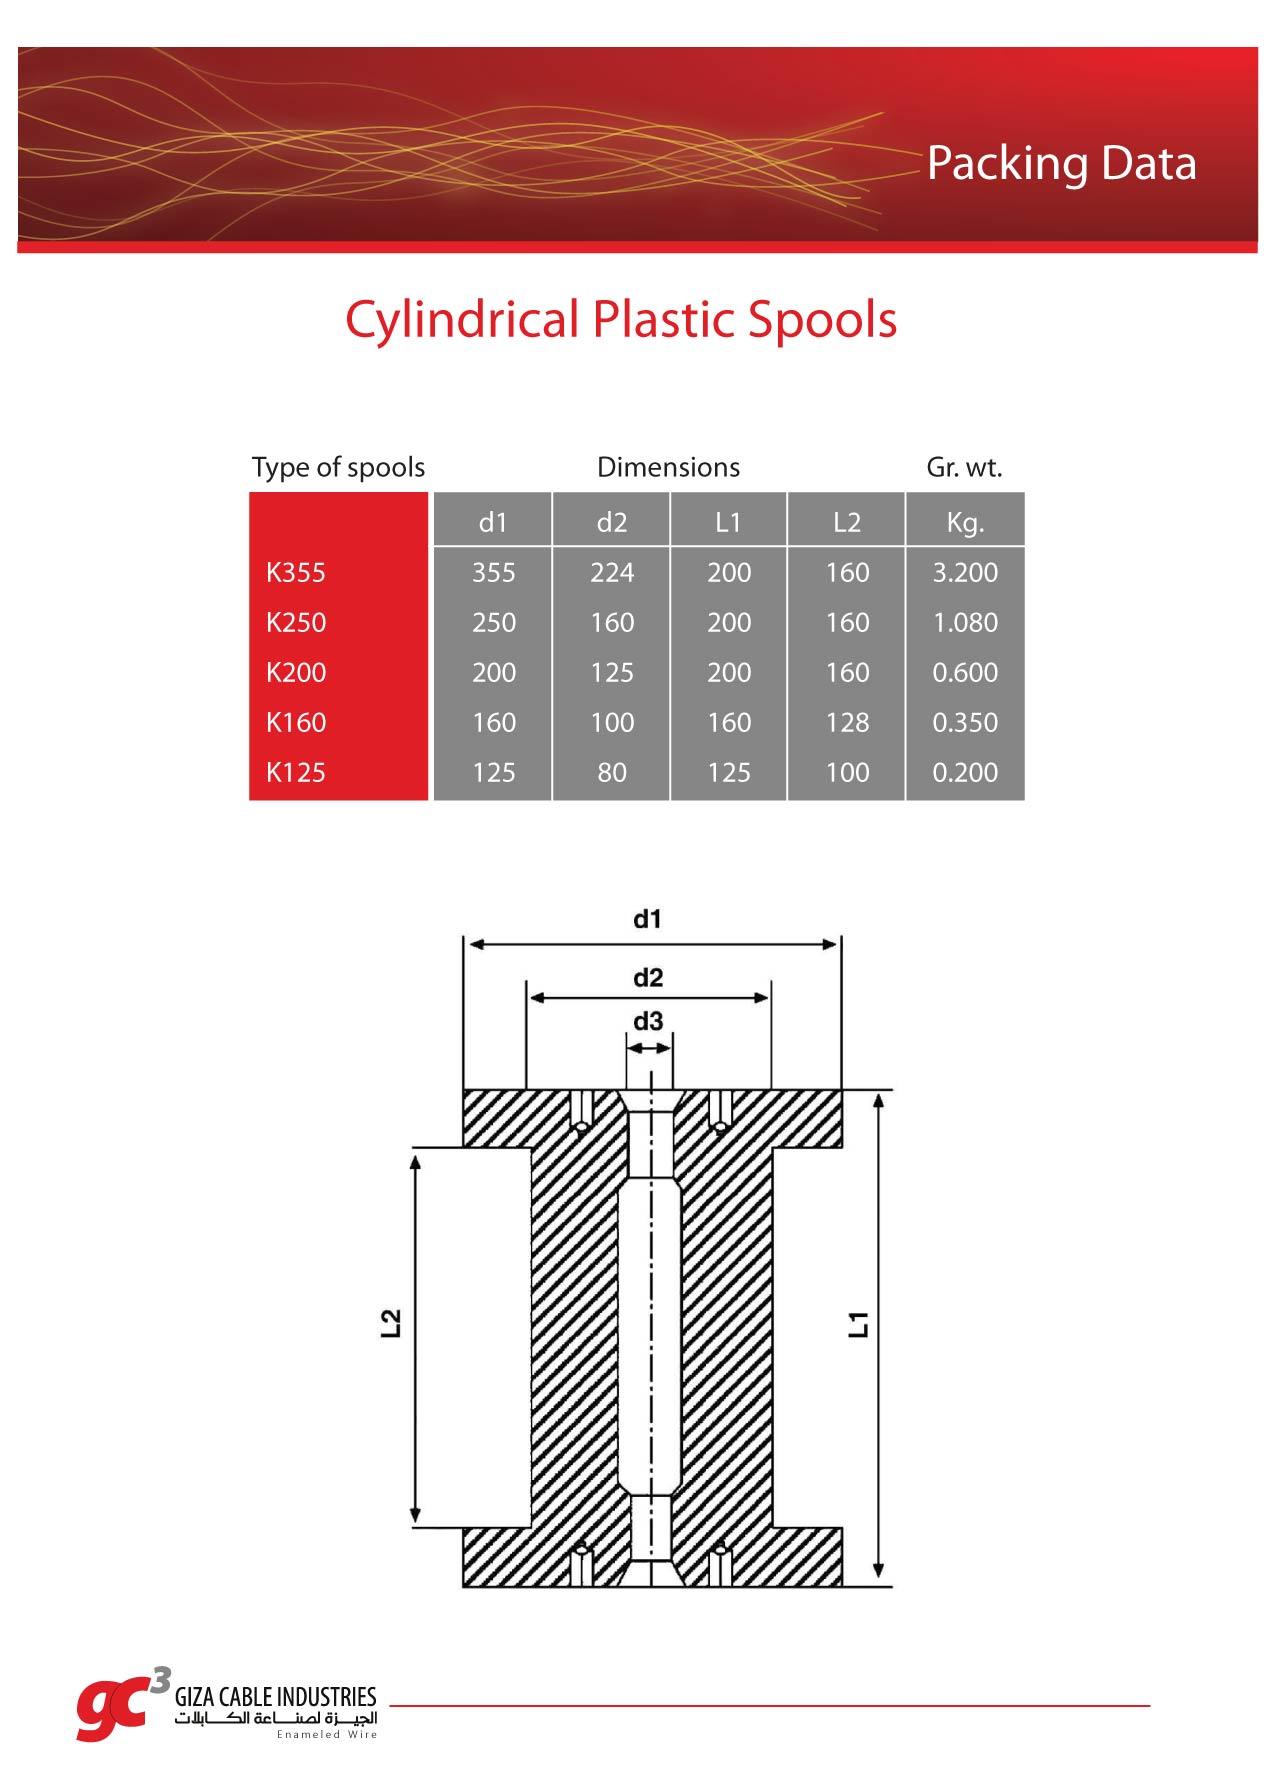 Cylindrical Plastic Spools